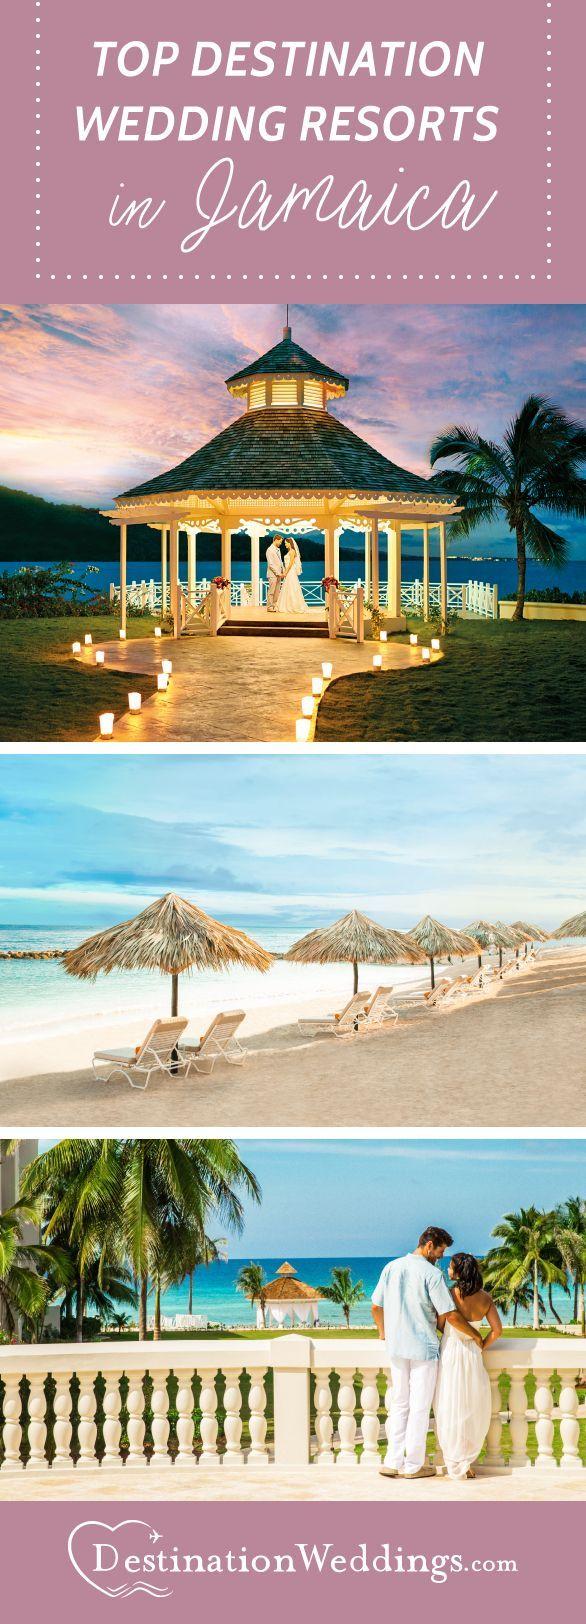 Jamaica Destination Wedding Resorts Where to Stay